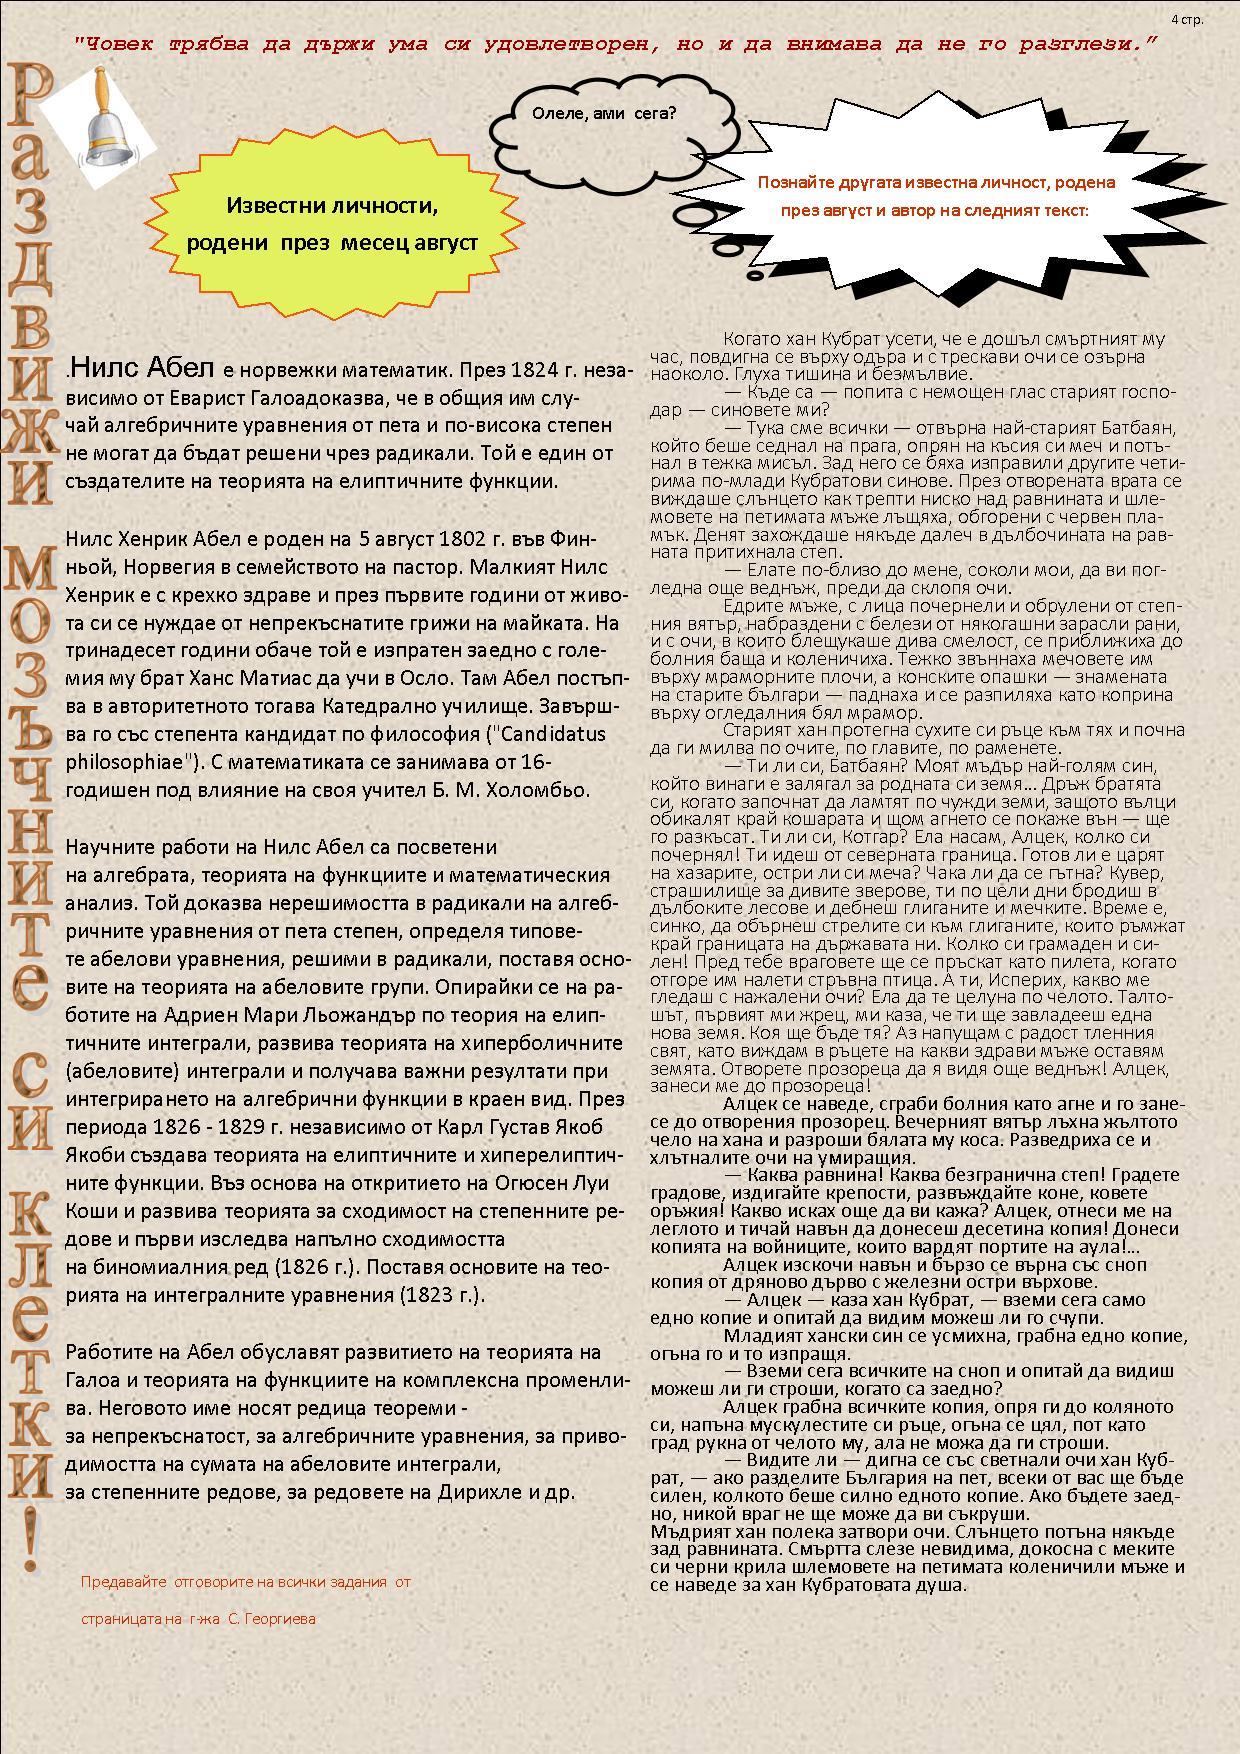 1вестник-8-ми бр-август-стр4 за 2013